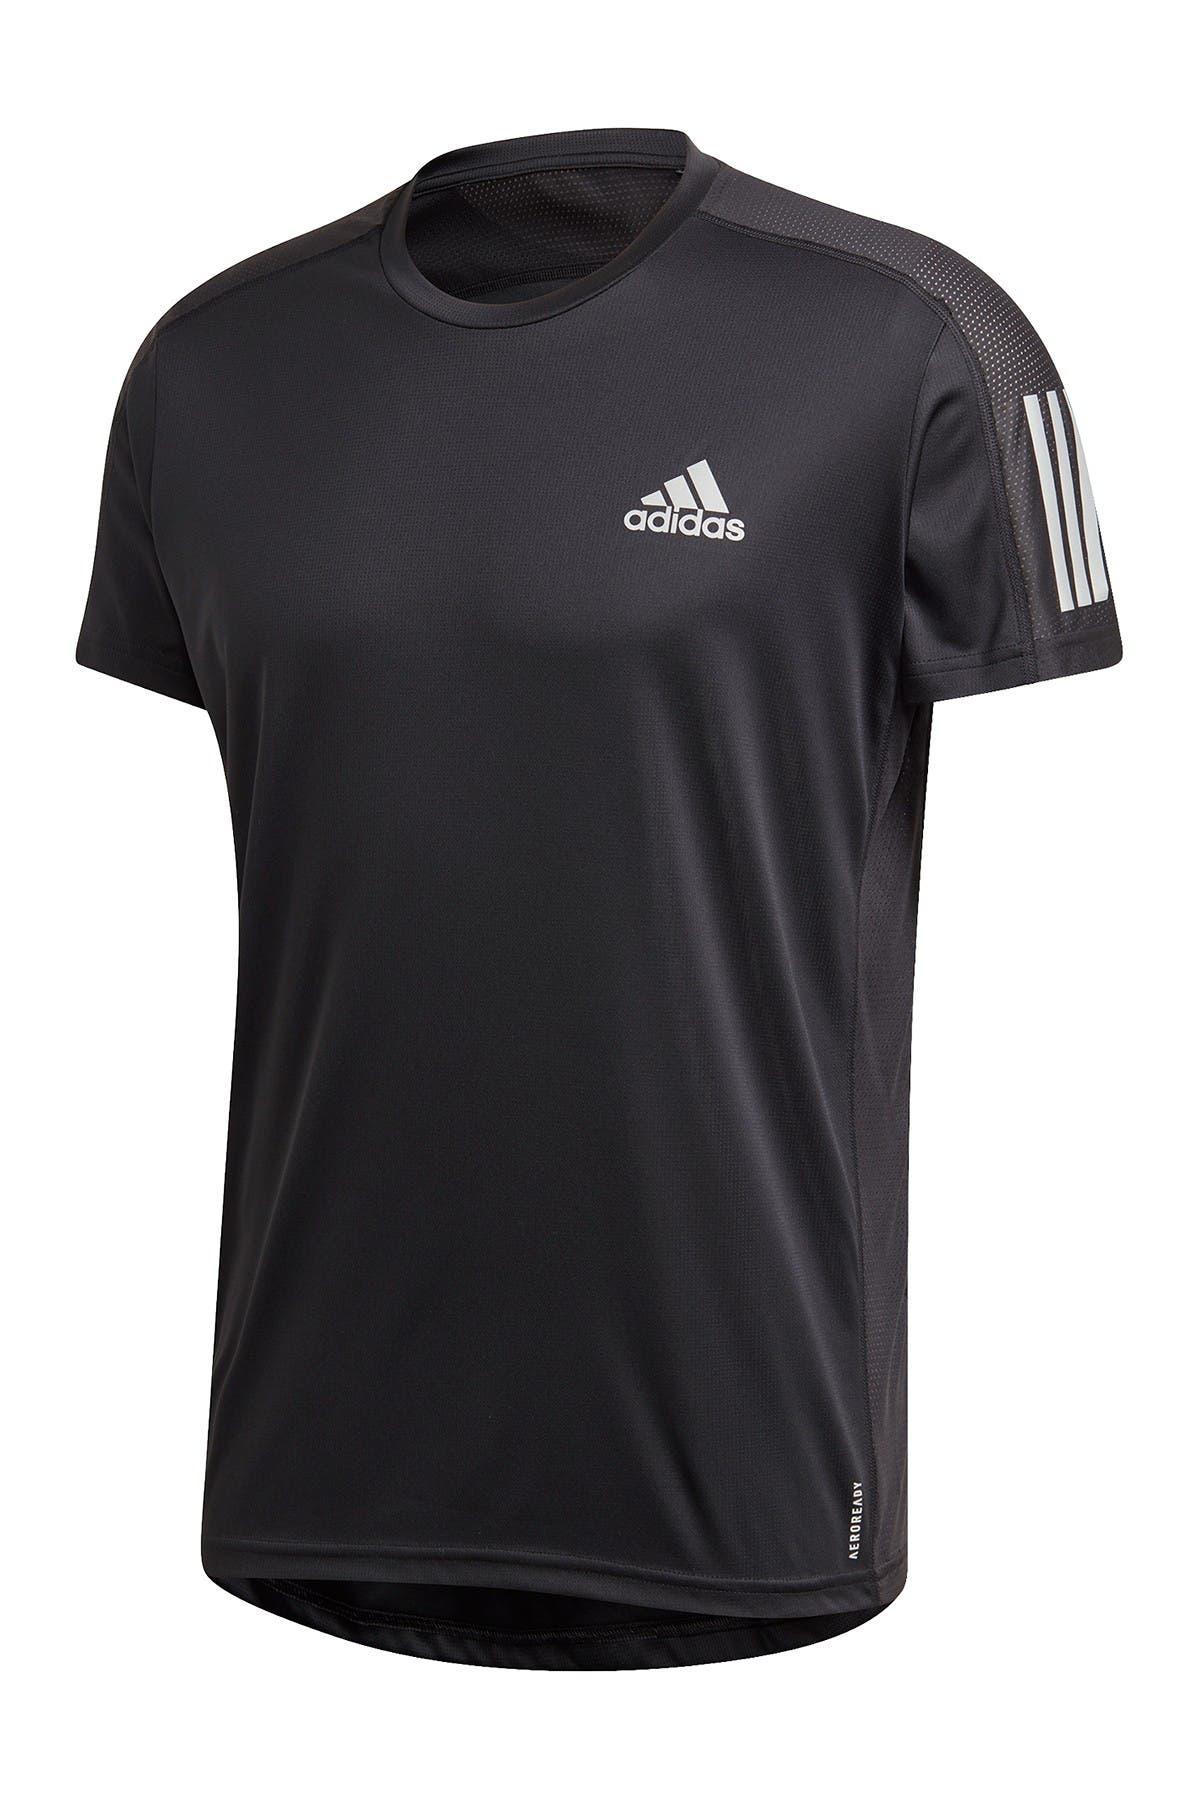 Image of adidas Own the Run Tee